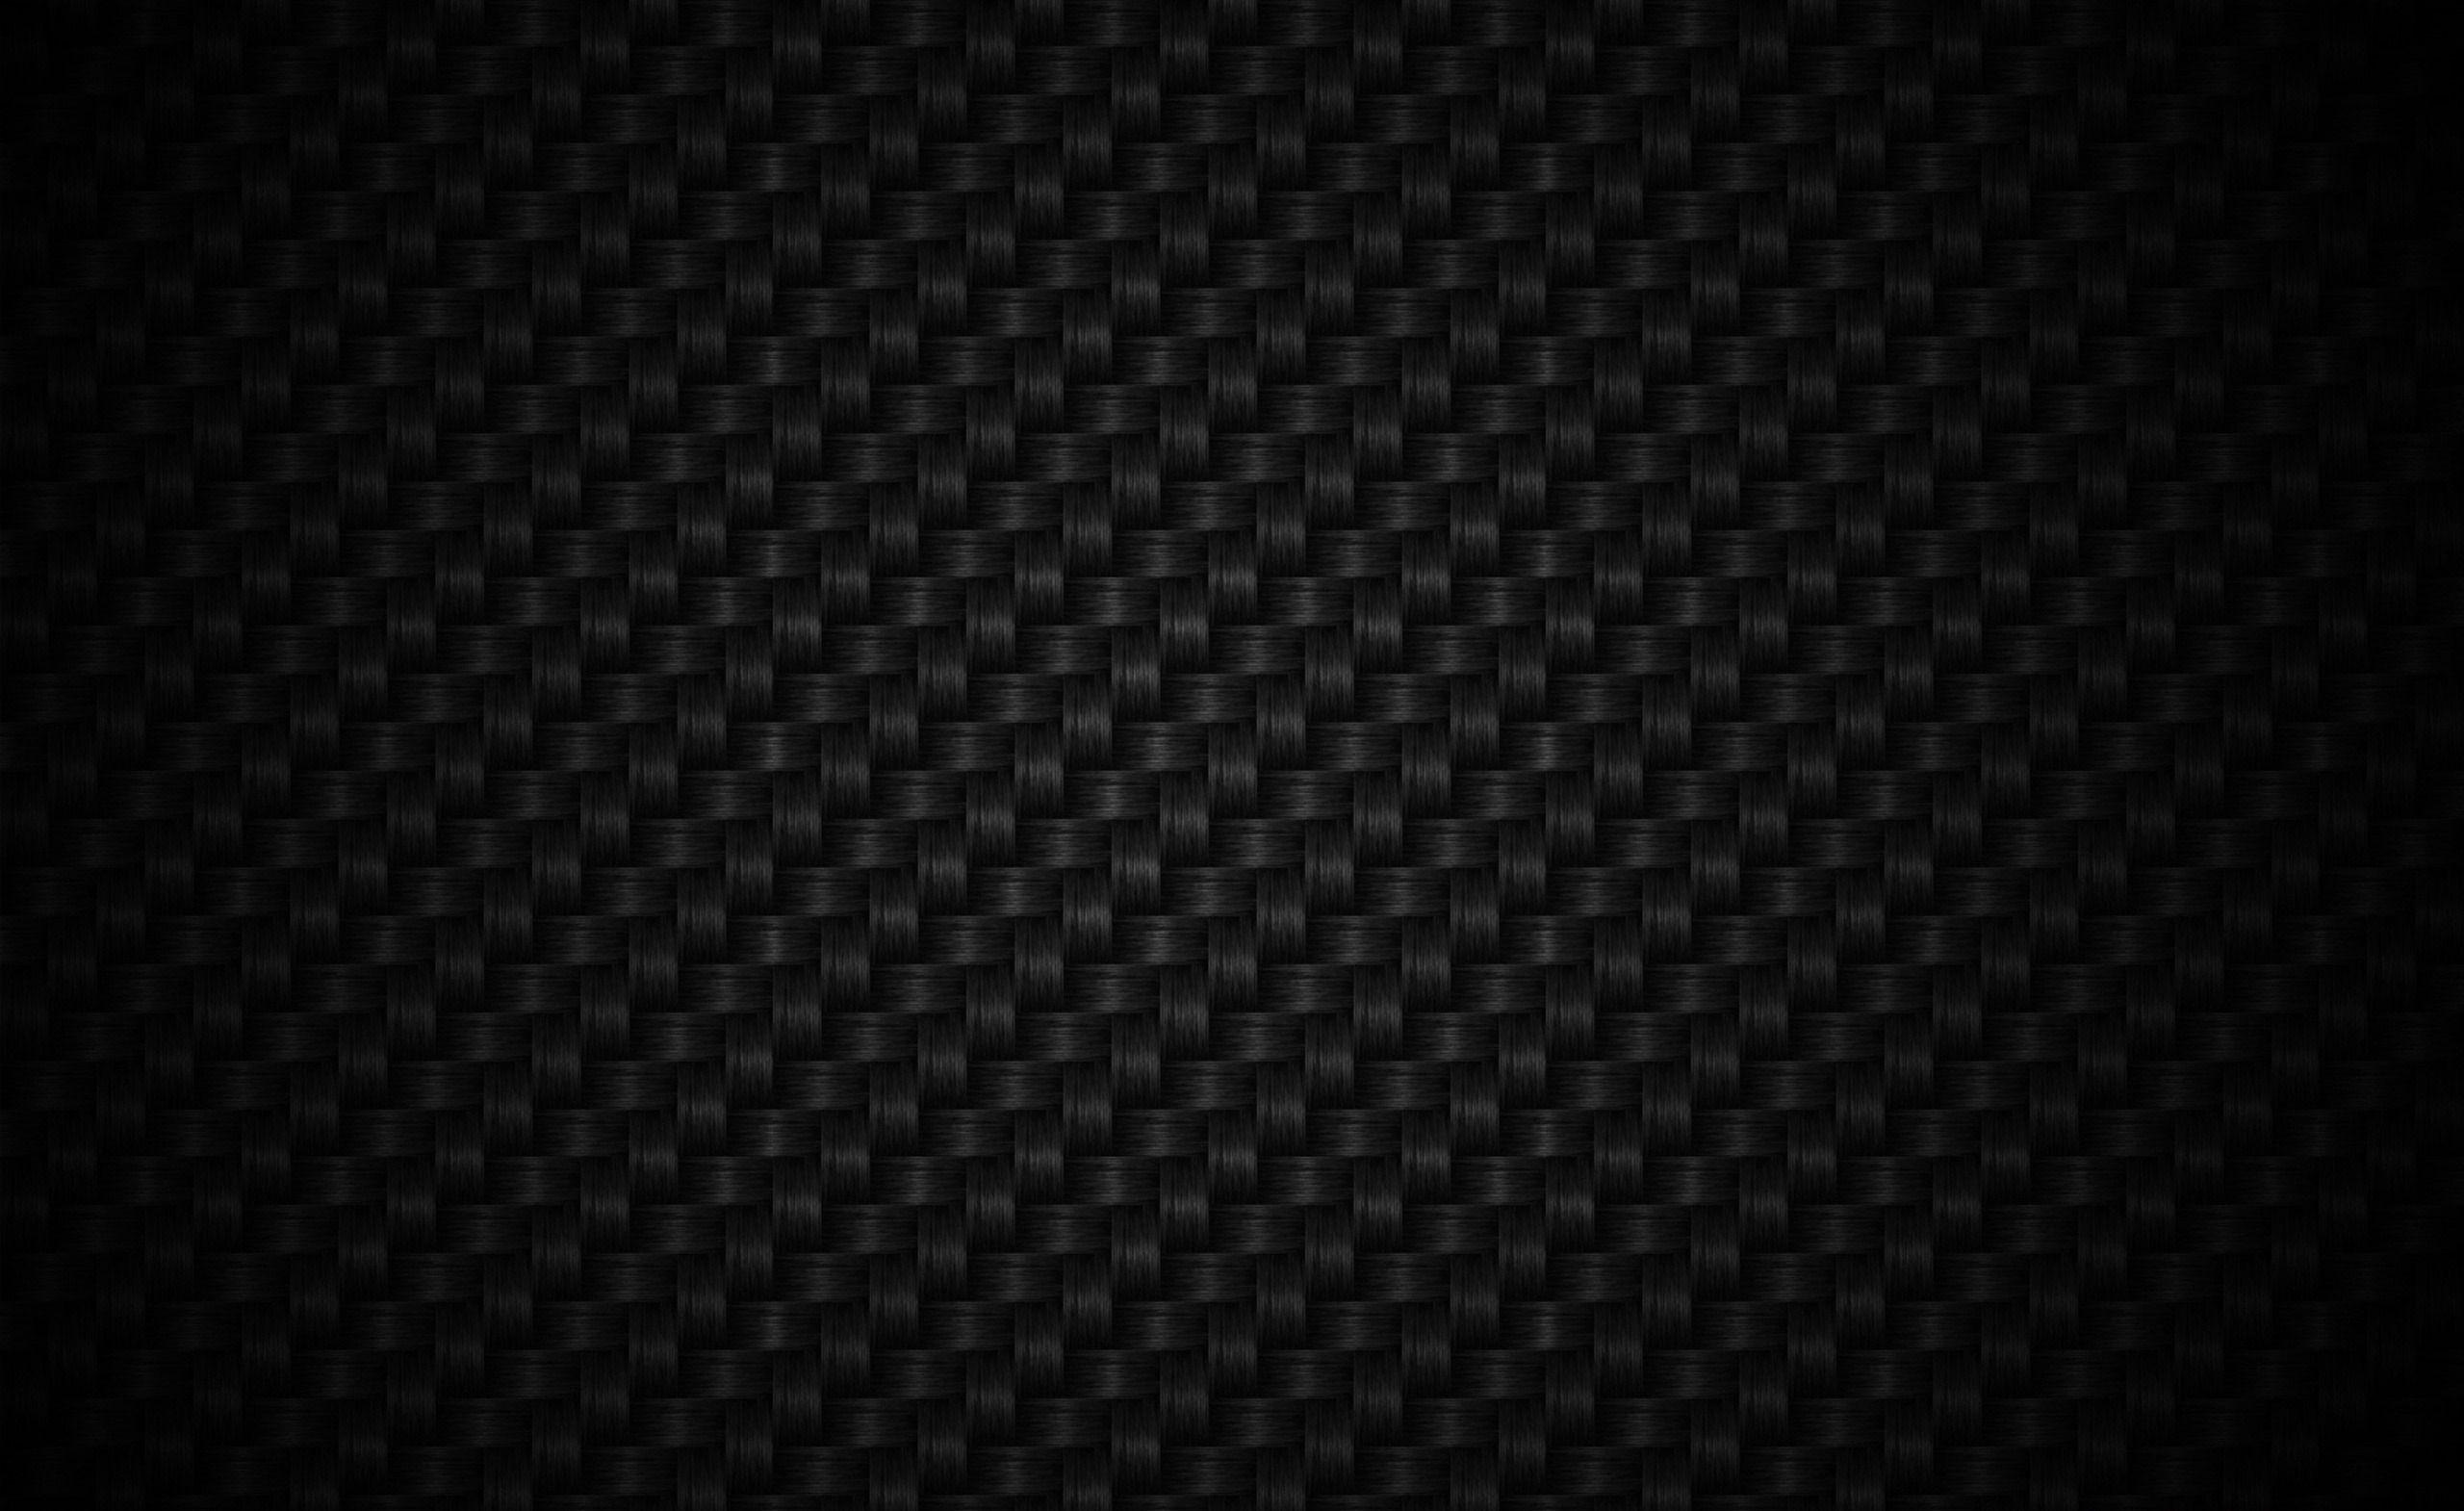 Black-Wallpaper-Wallpaper-HD